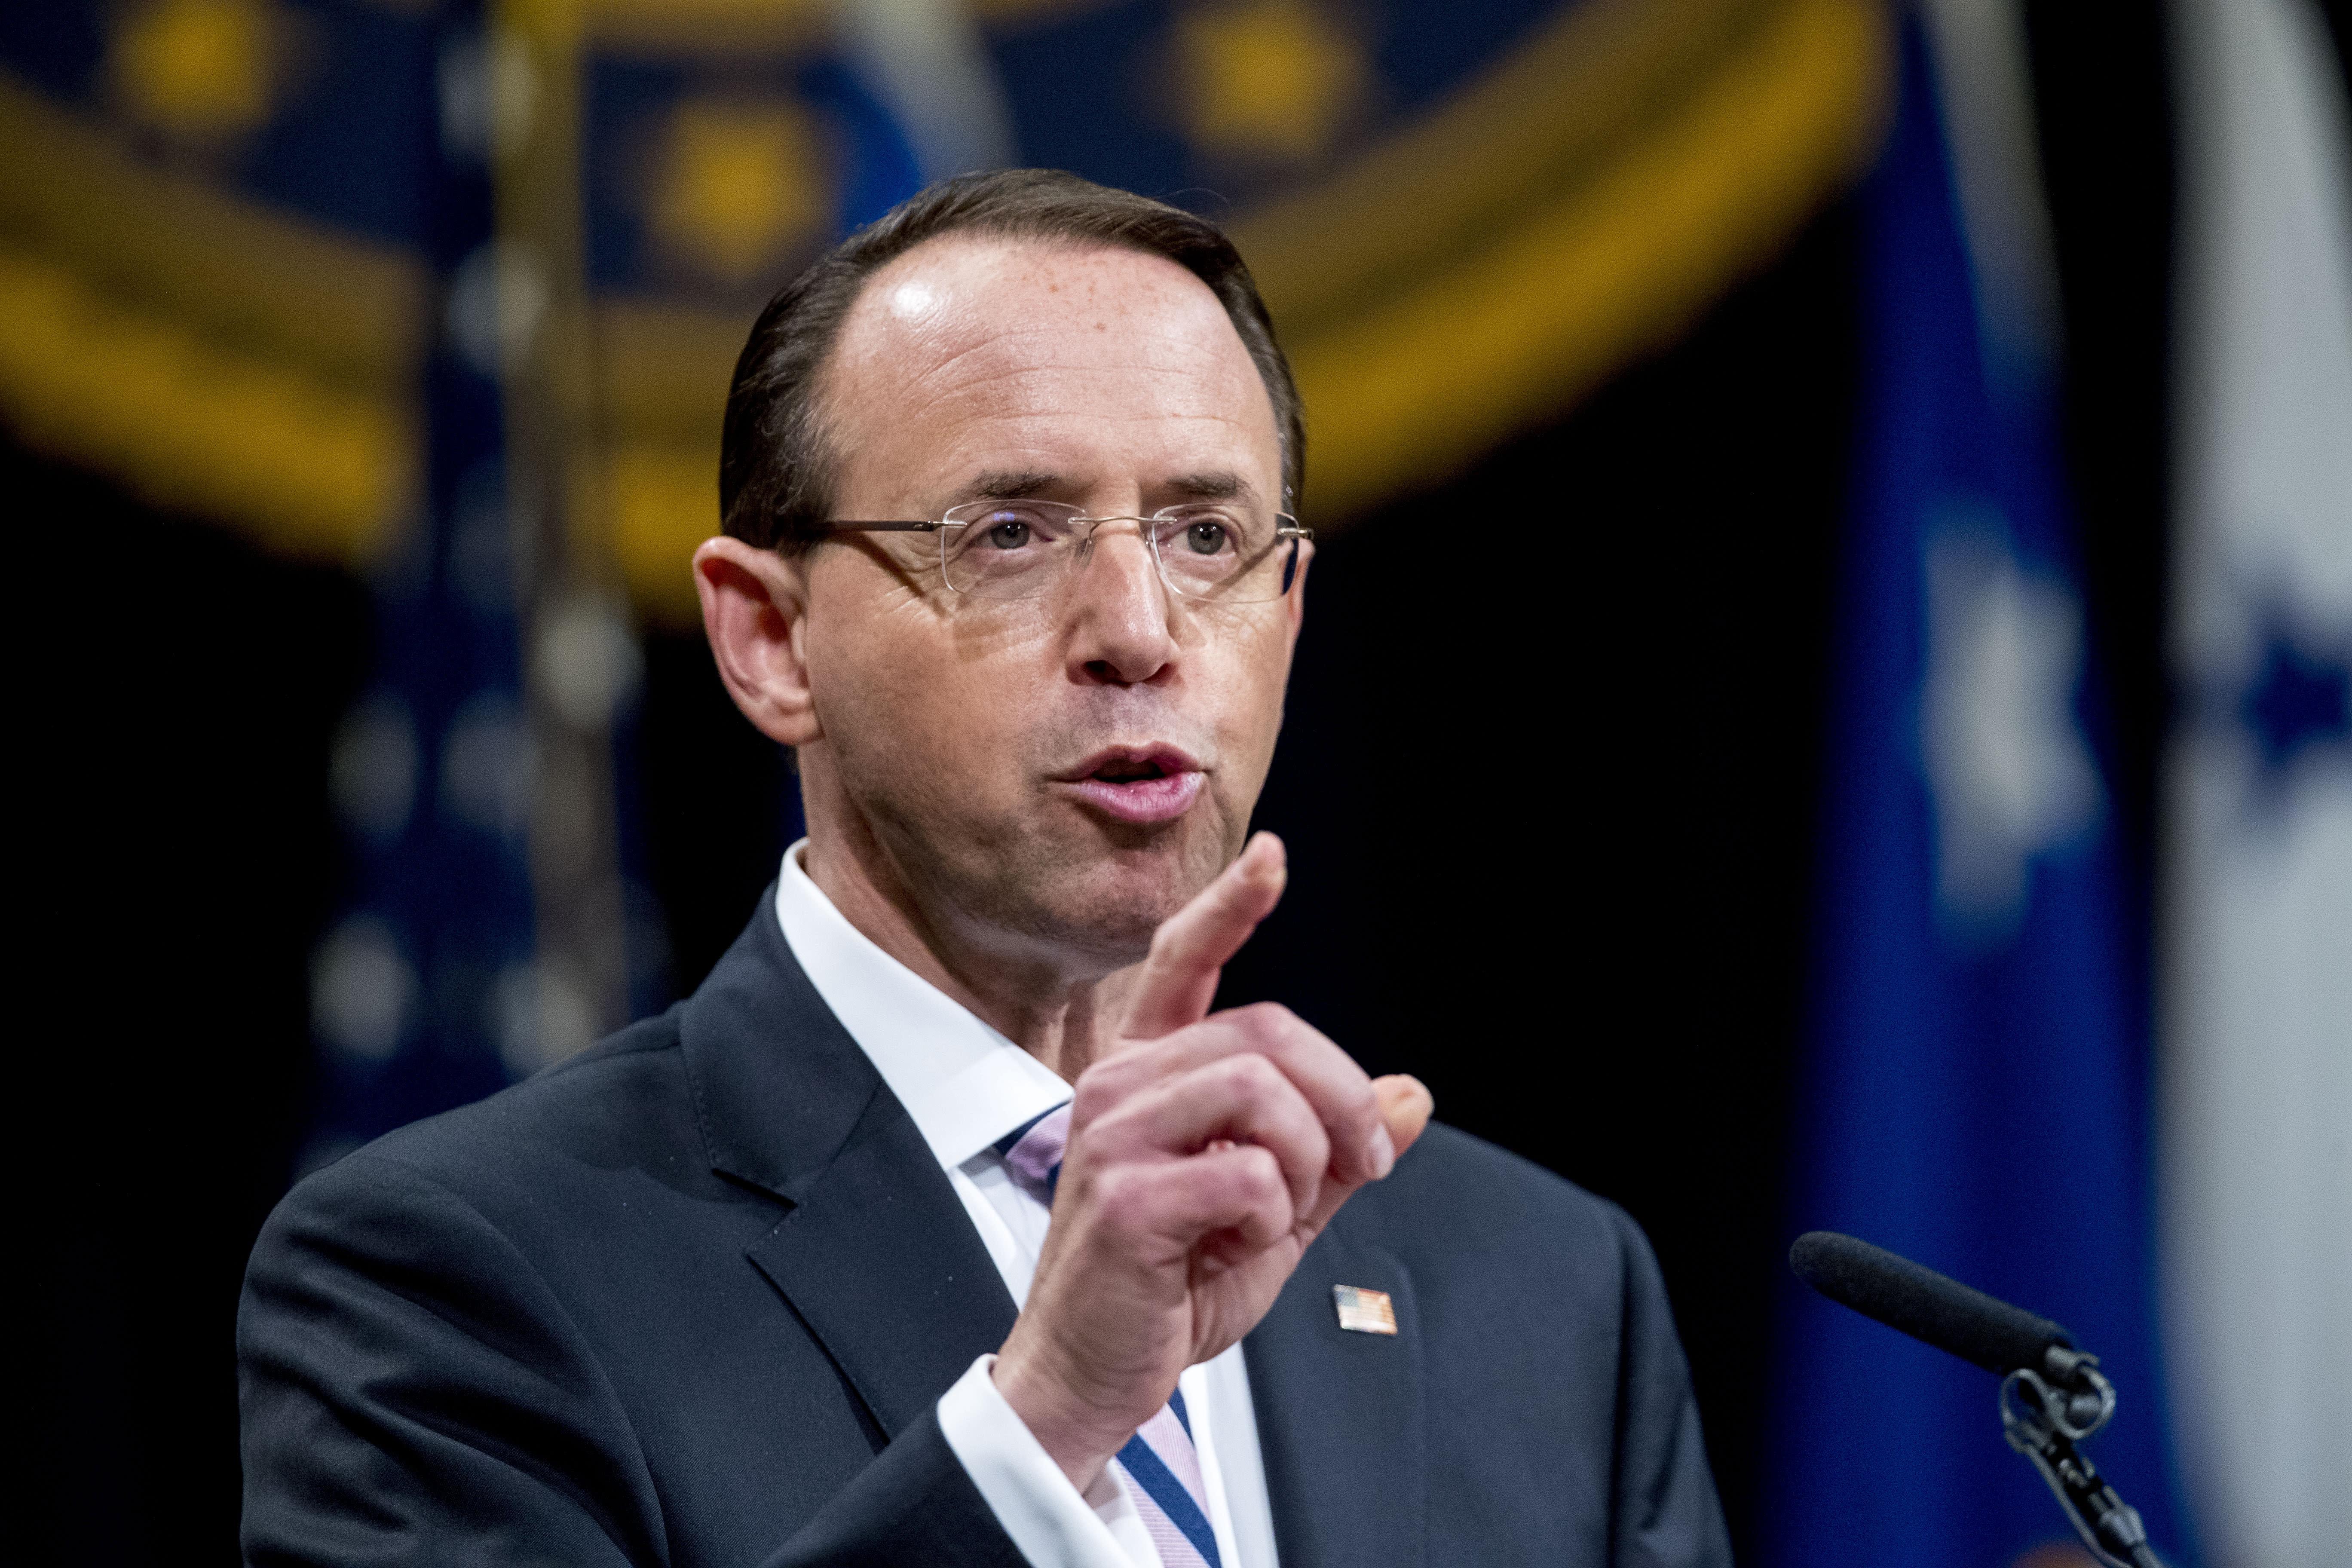 Rosenstein: Russia probe justified, closing it wasn't option